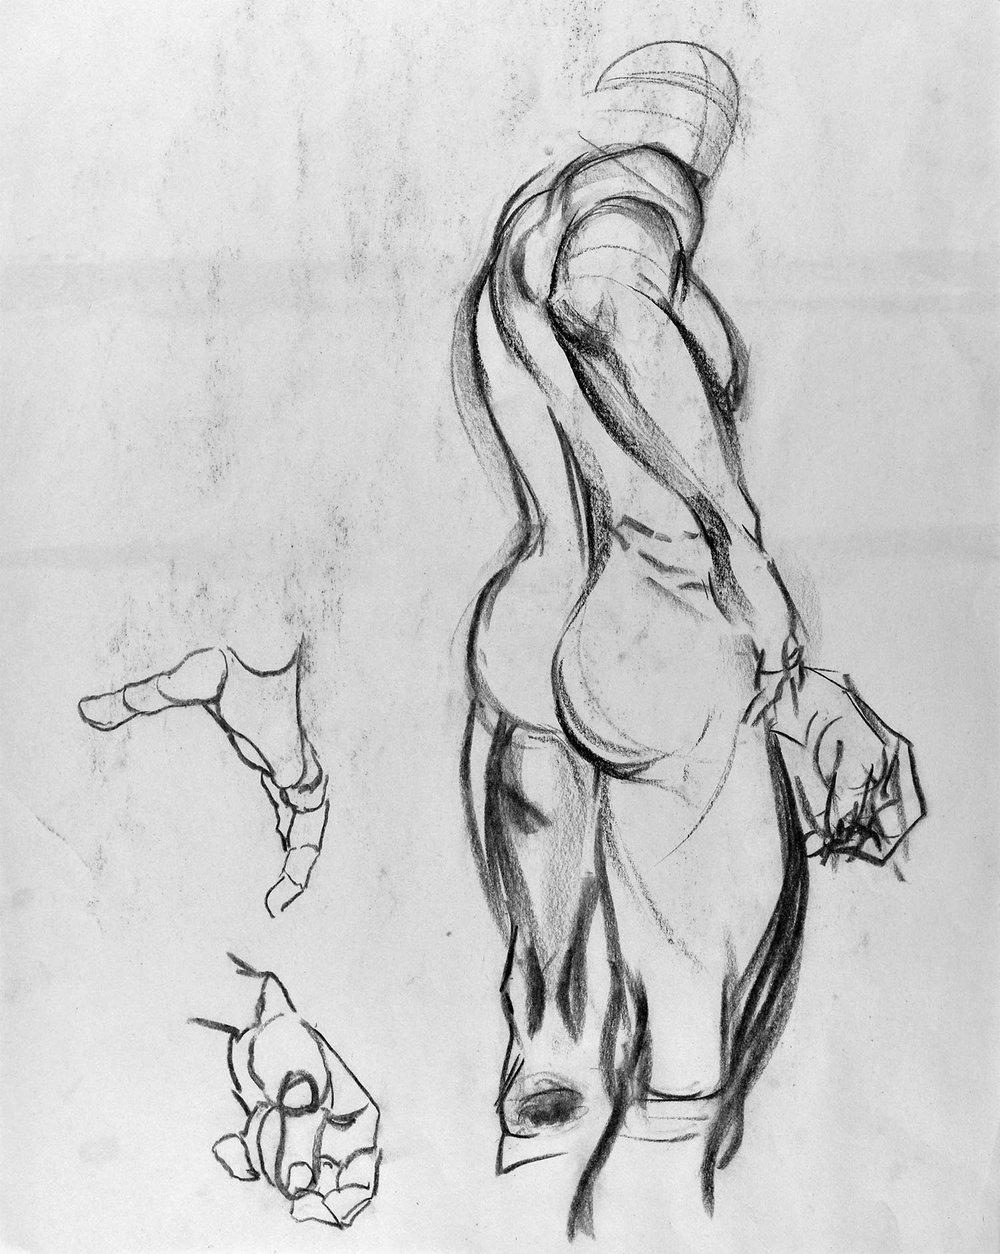 course-figure-drawing-works-15-v01-2018-08.jpg